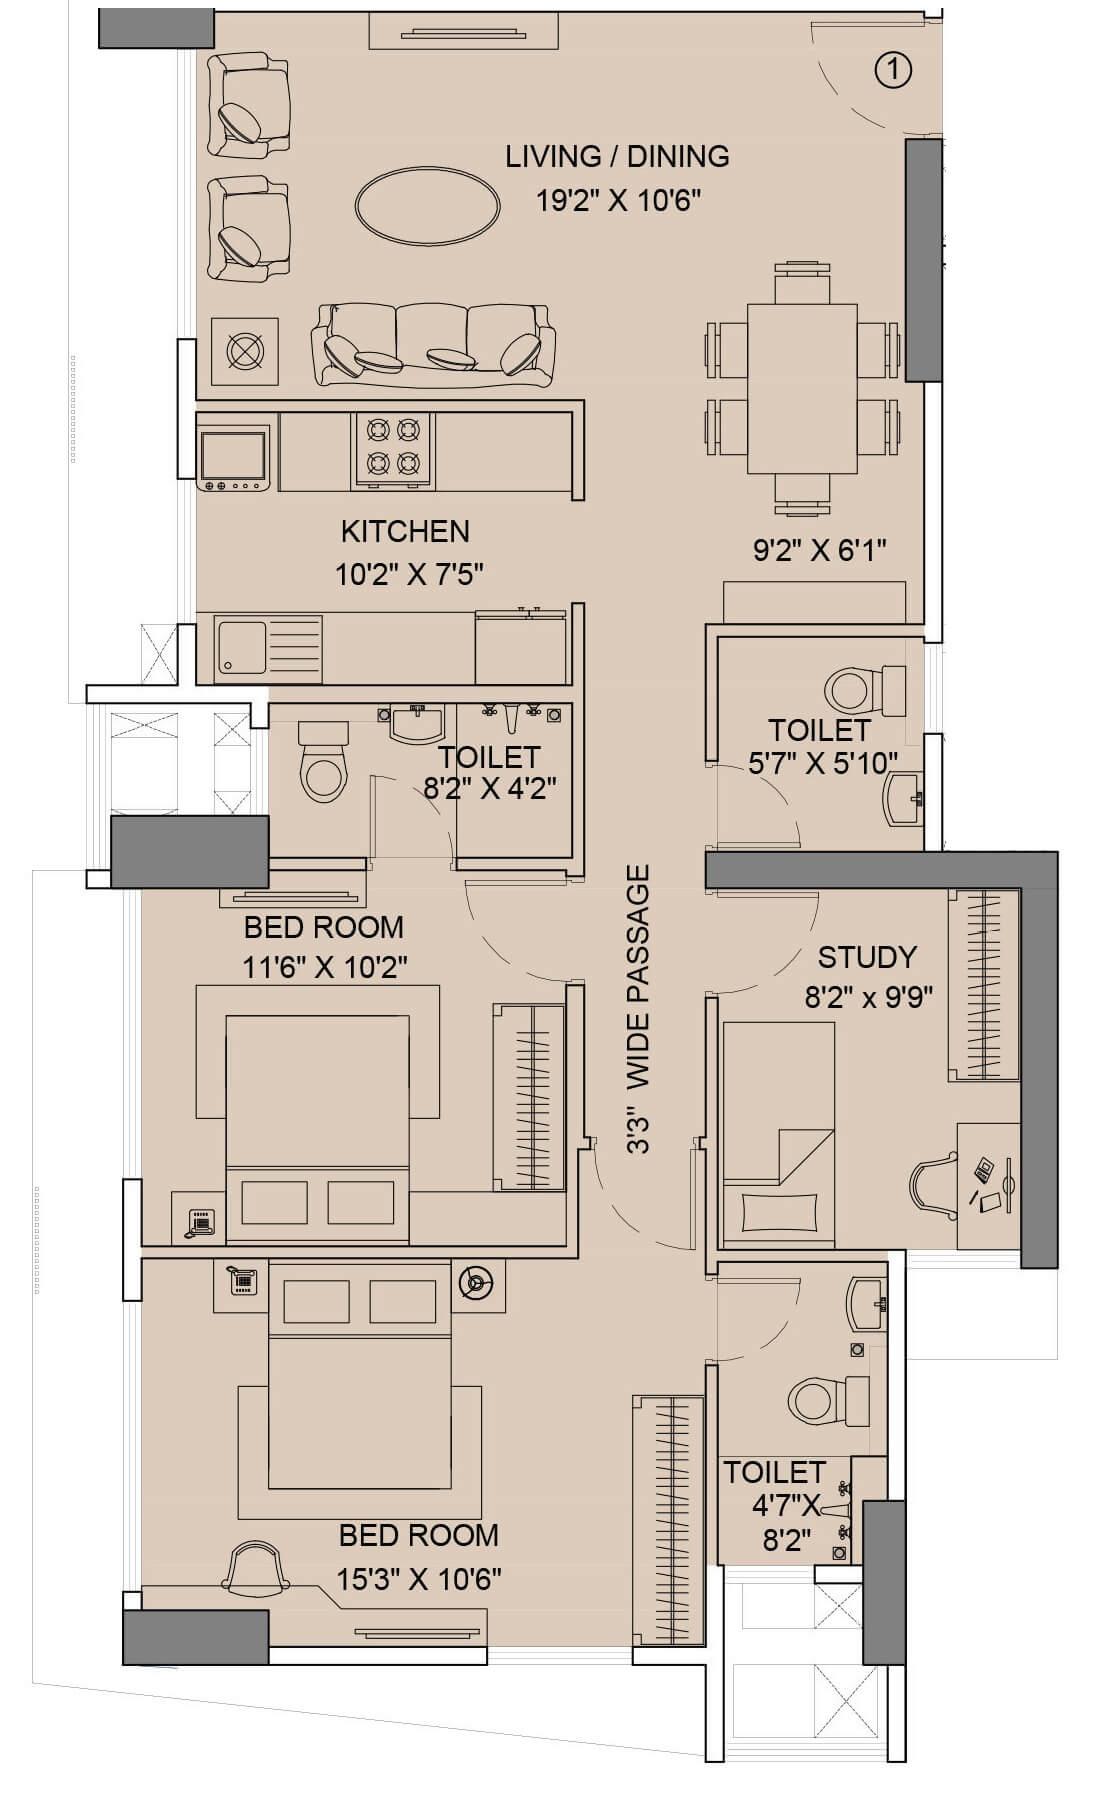 sunteck city avenue 2 apartment 3bhk 894sqft 1